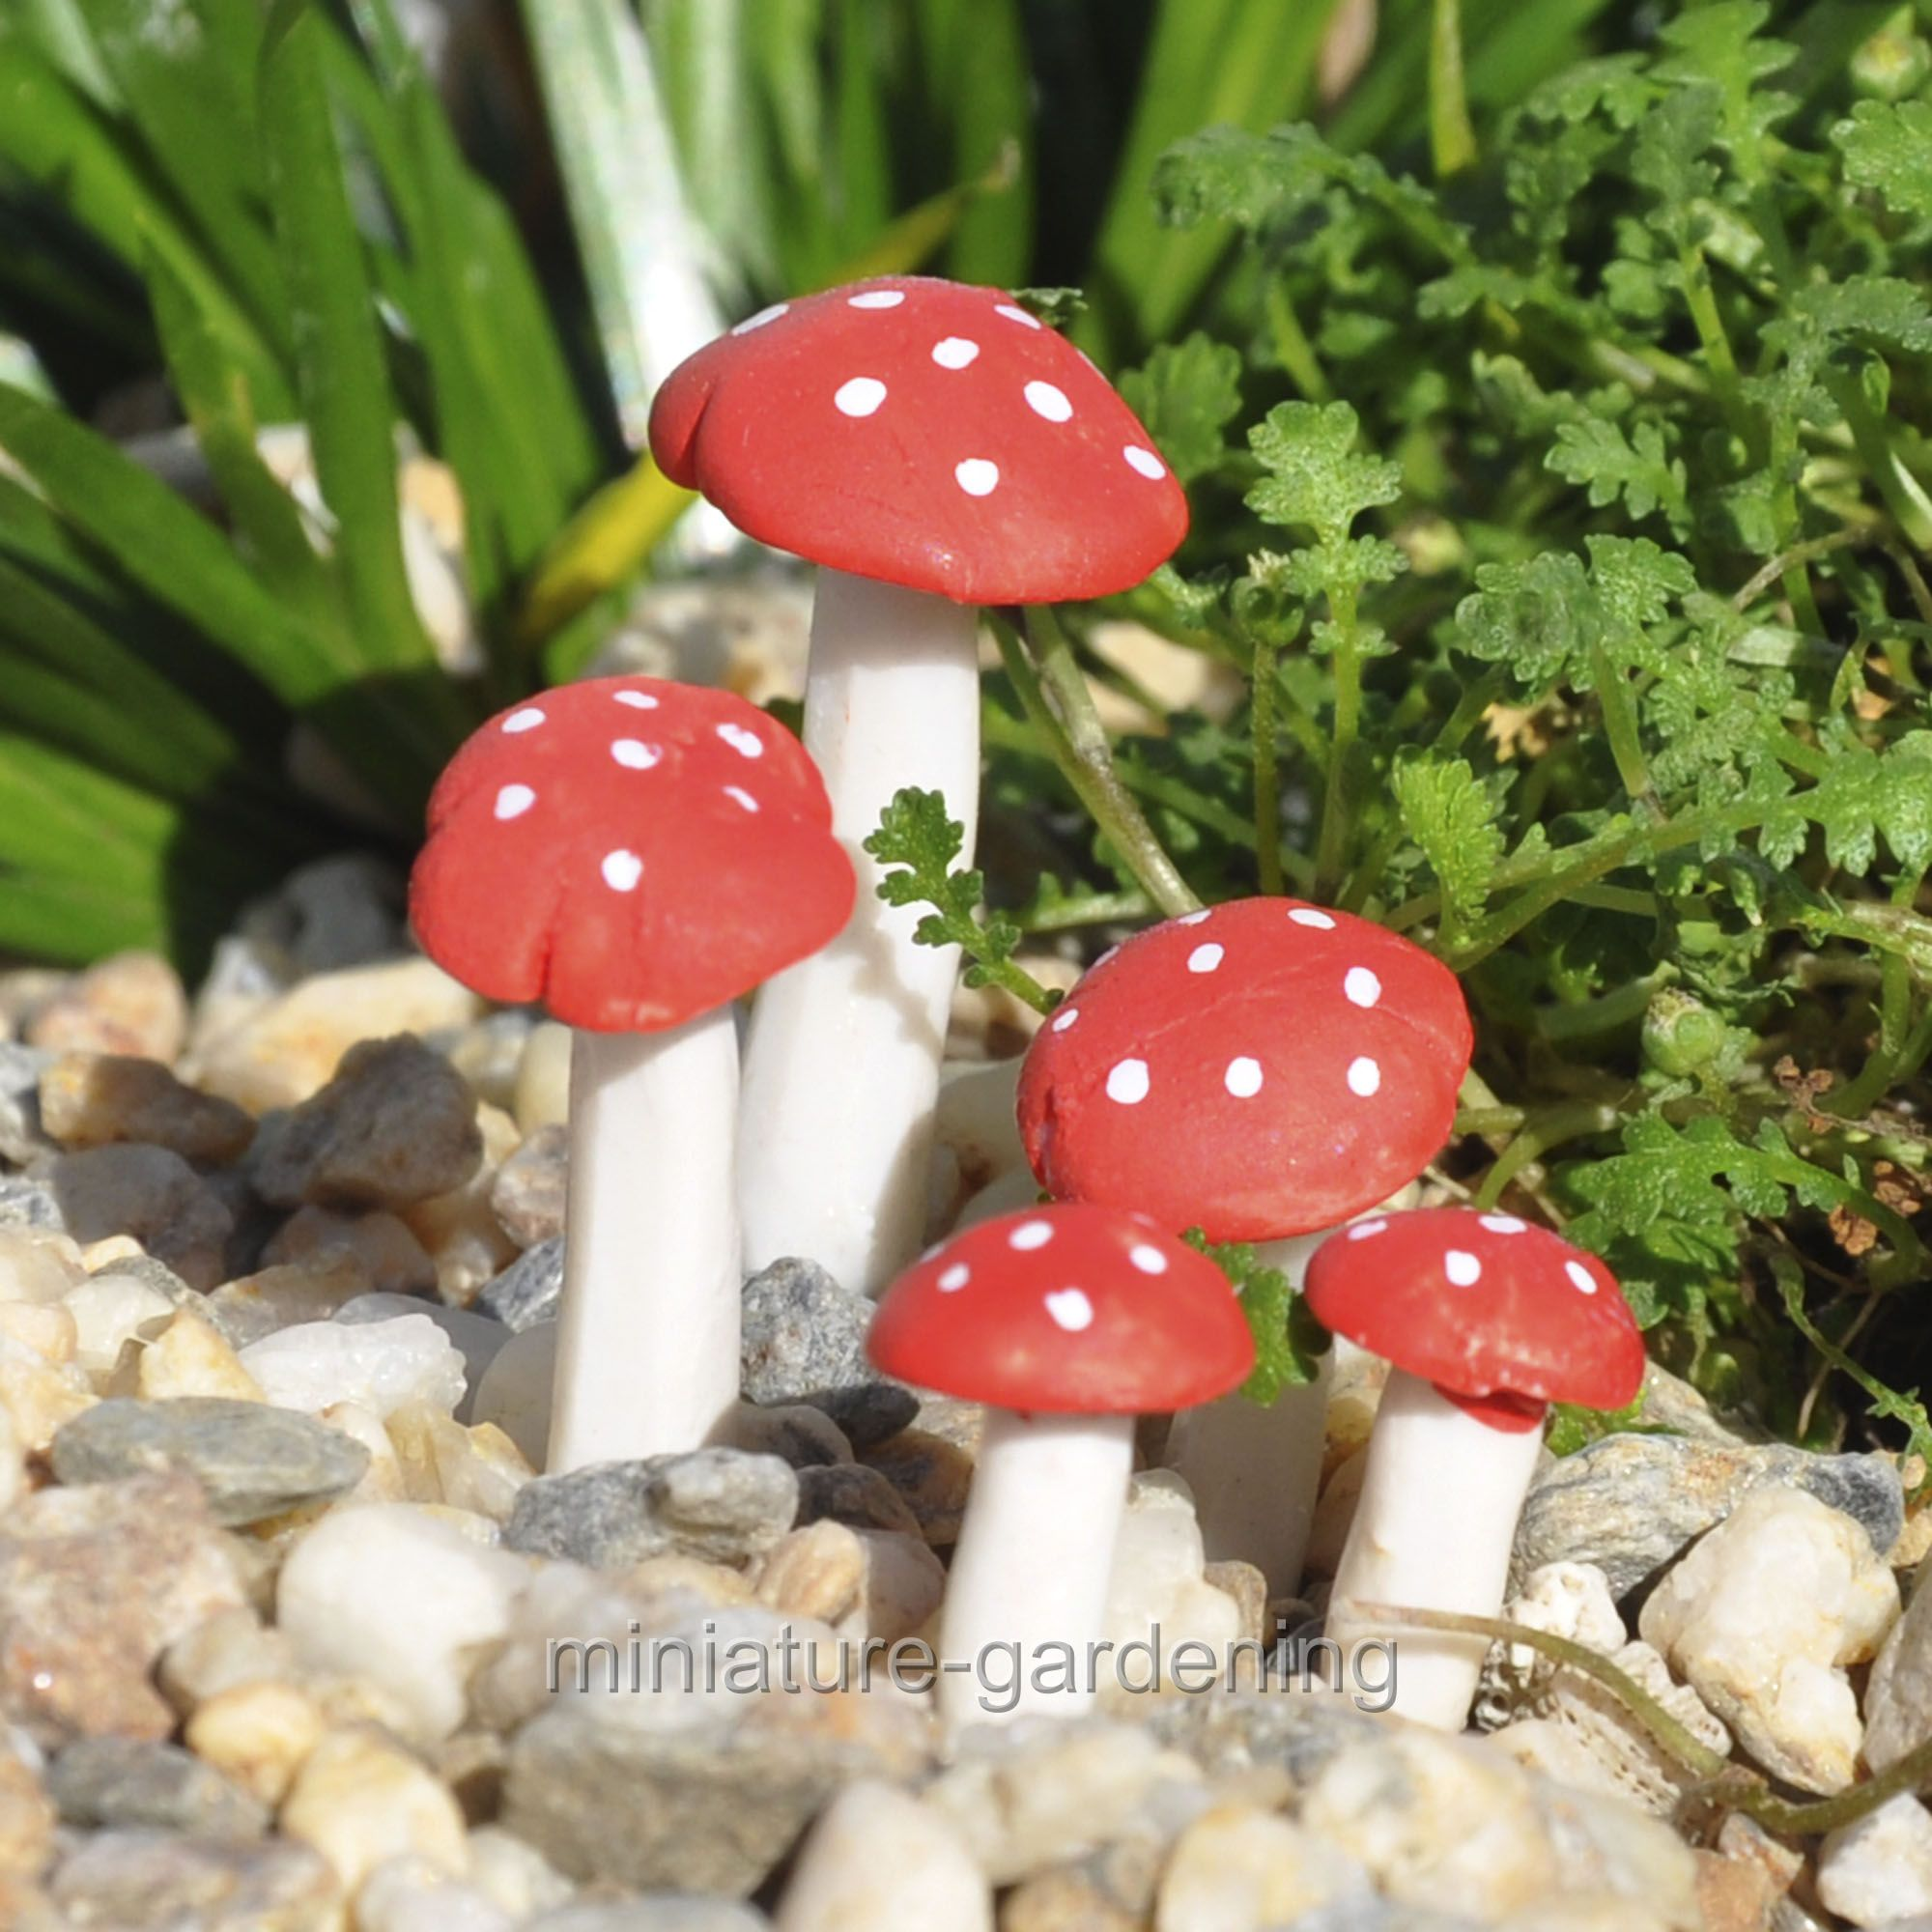 Miniature Fly Agaric Mushroom Pics, 5 Piece Set for Miniature Garden, Fairy Garden